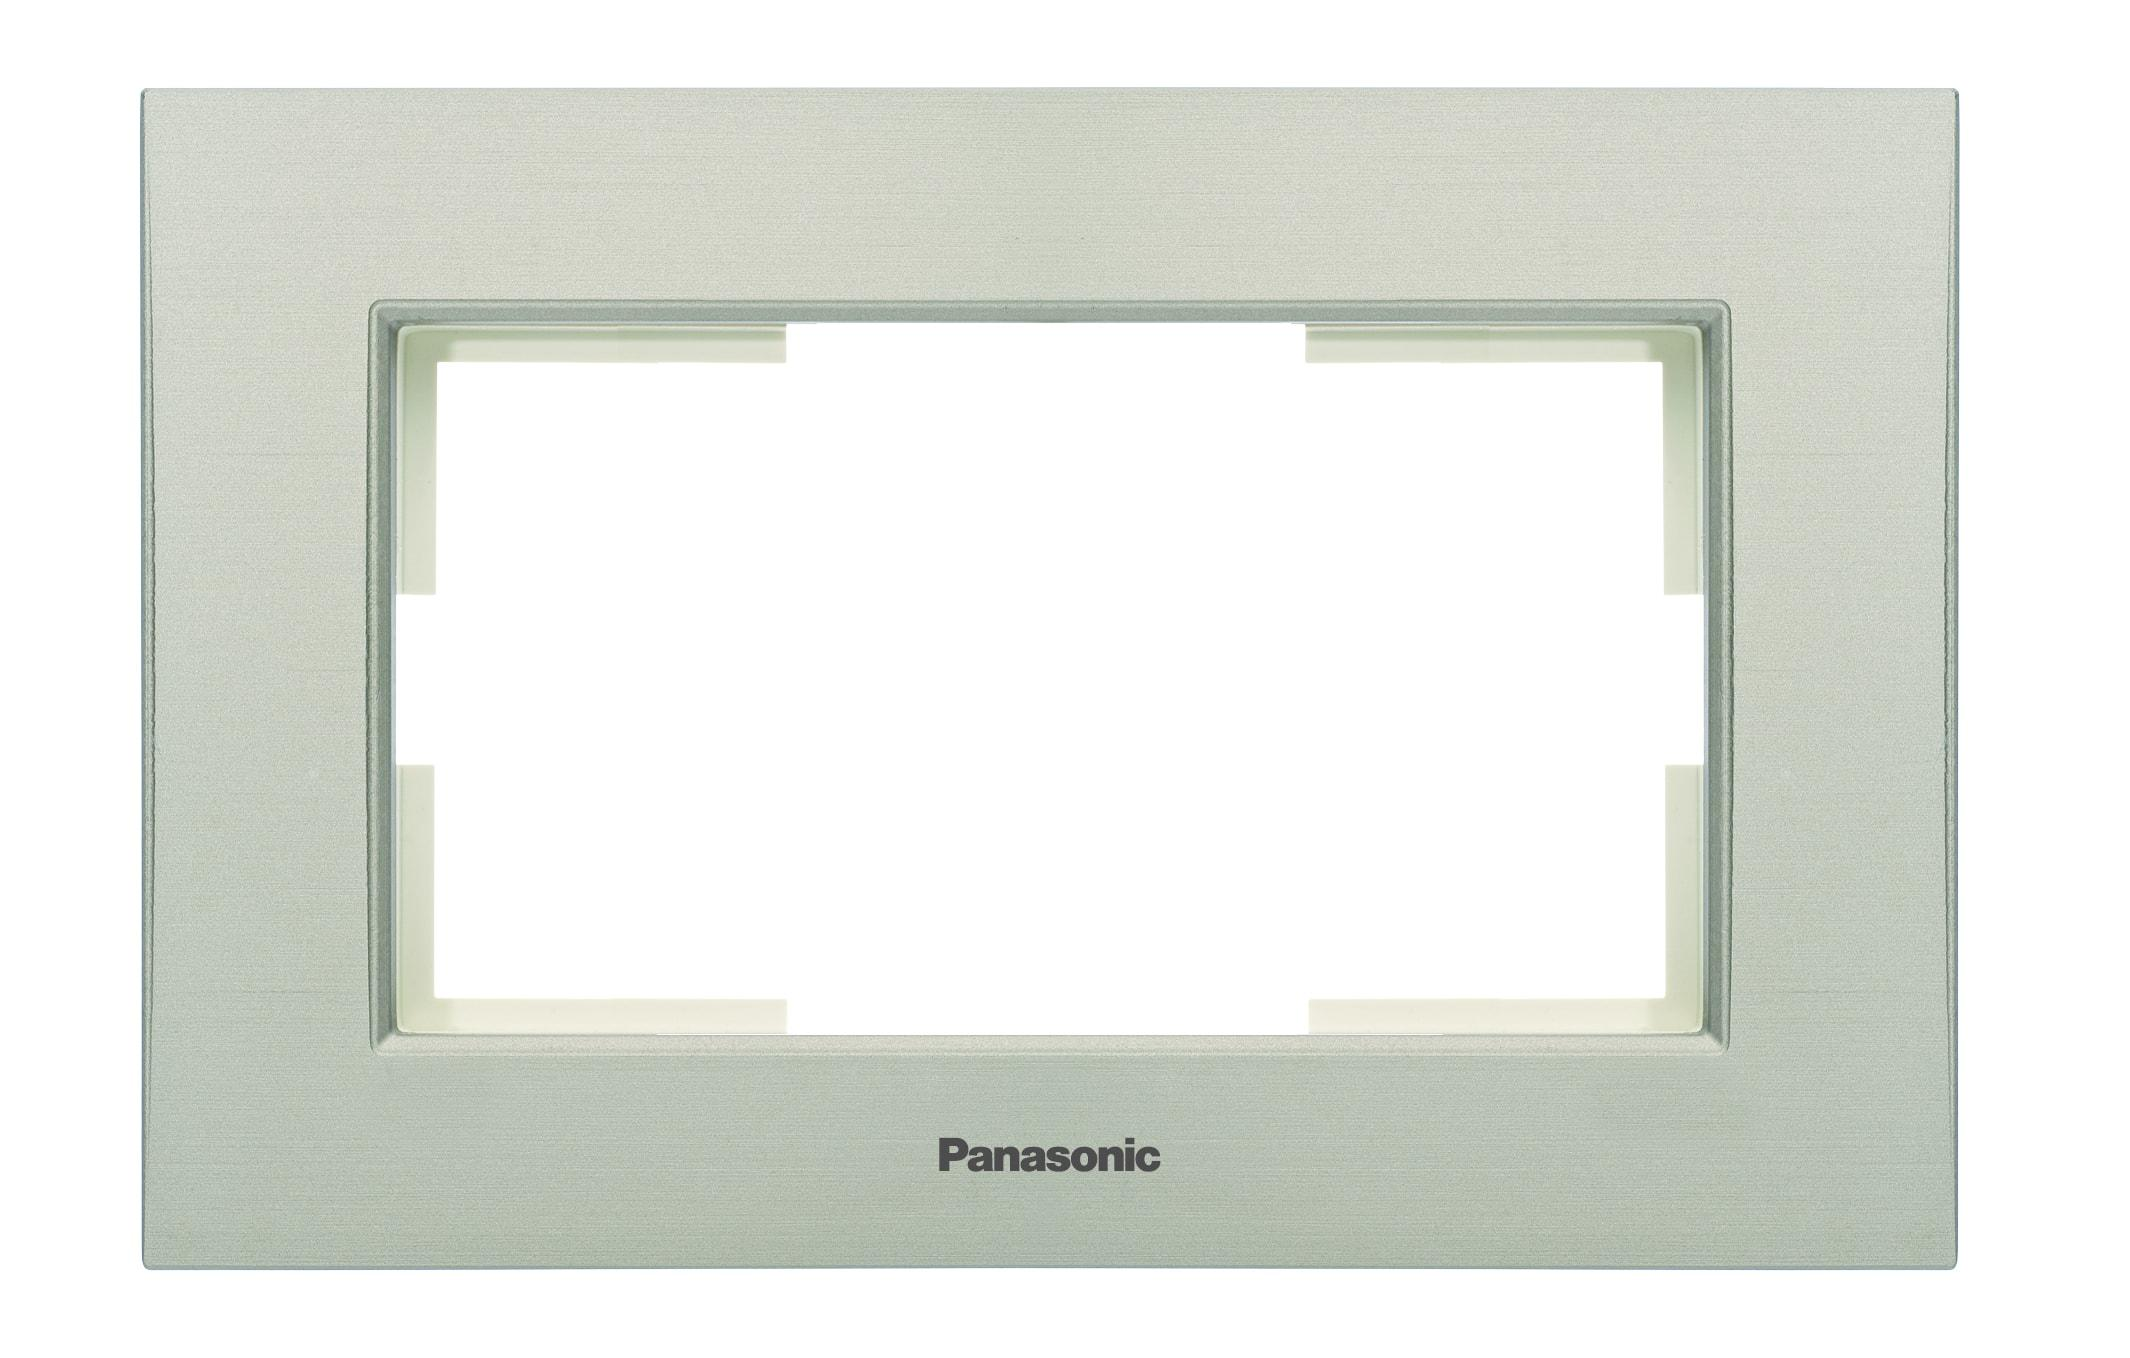 Рамка Panasonic Wktf0805-2sl-res karre plus 1n5819 b5819ws sl s4 sod323 0805